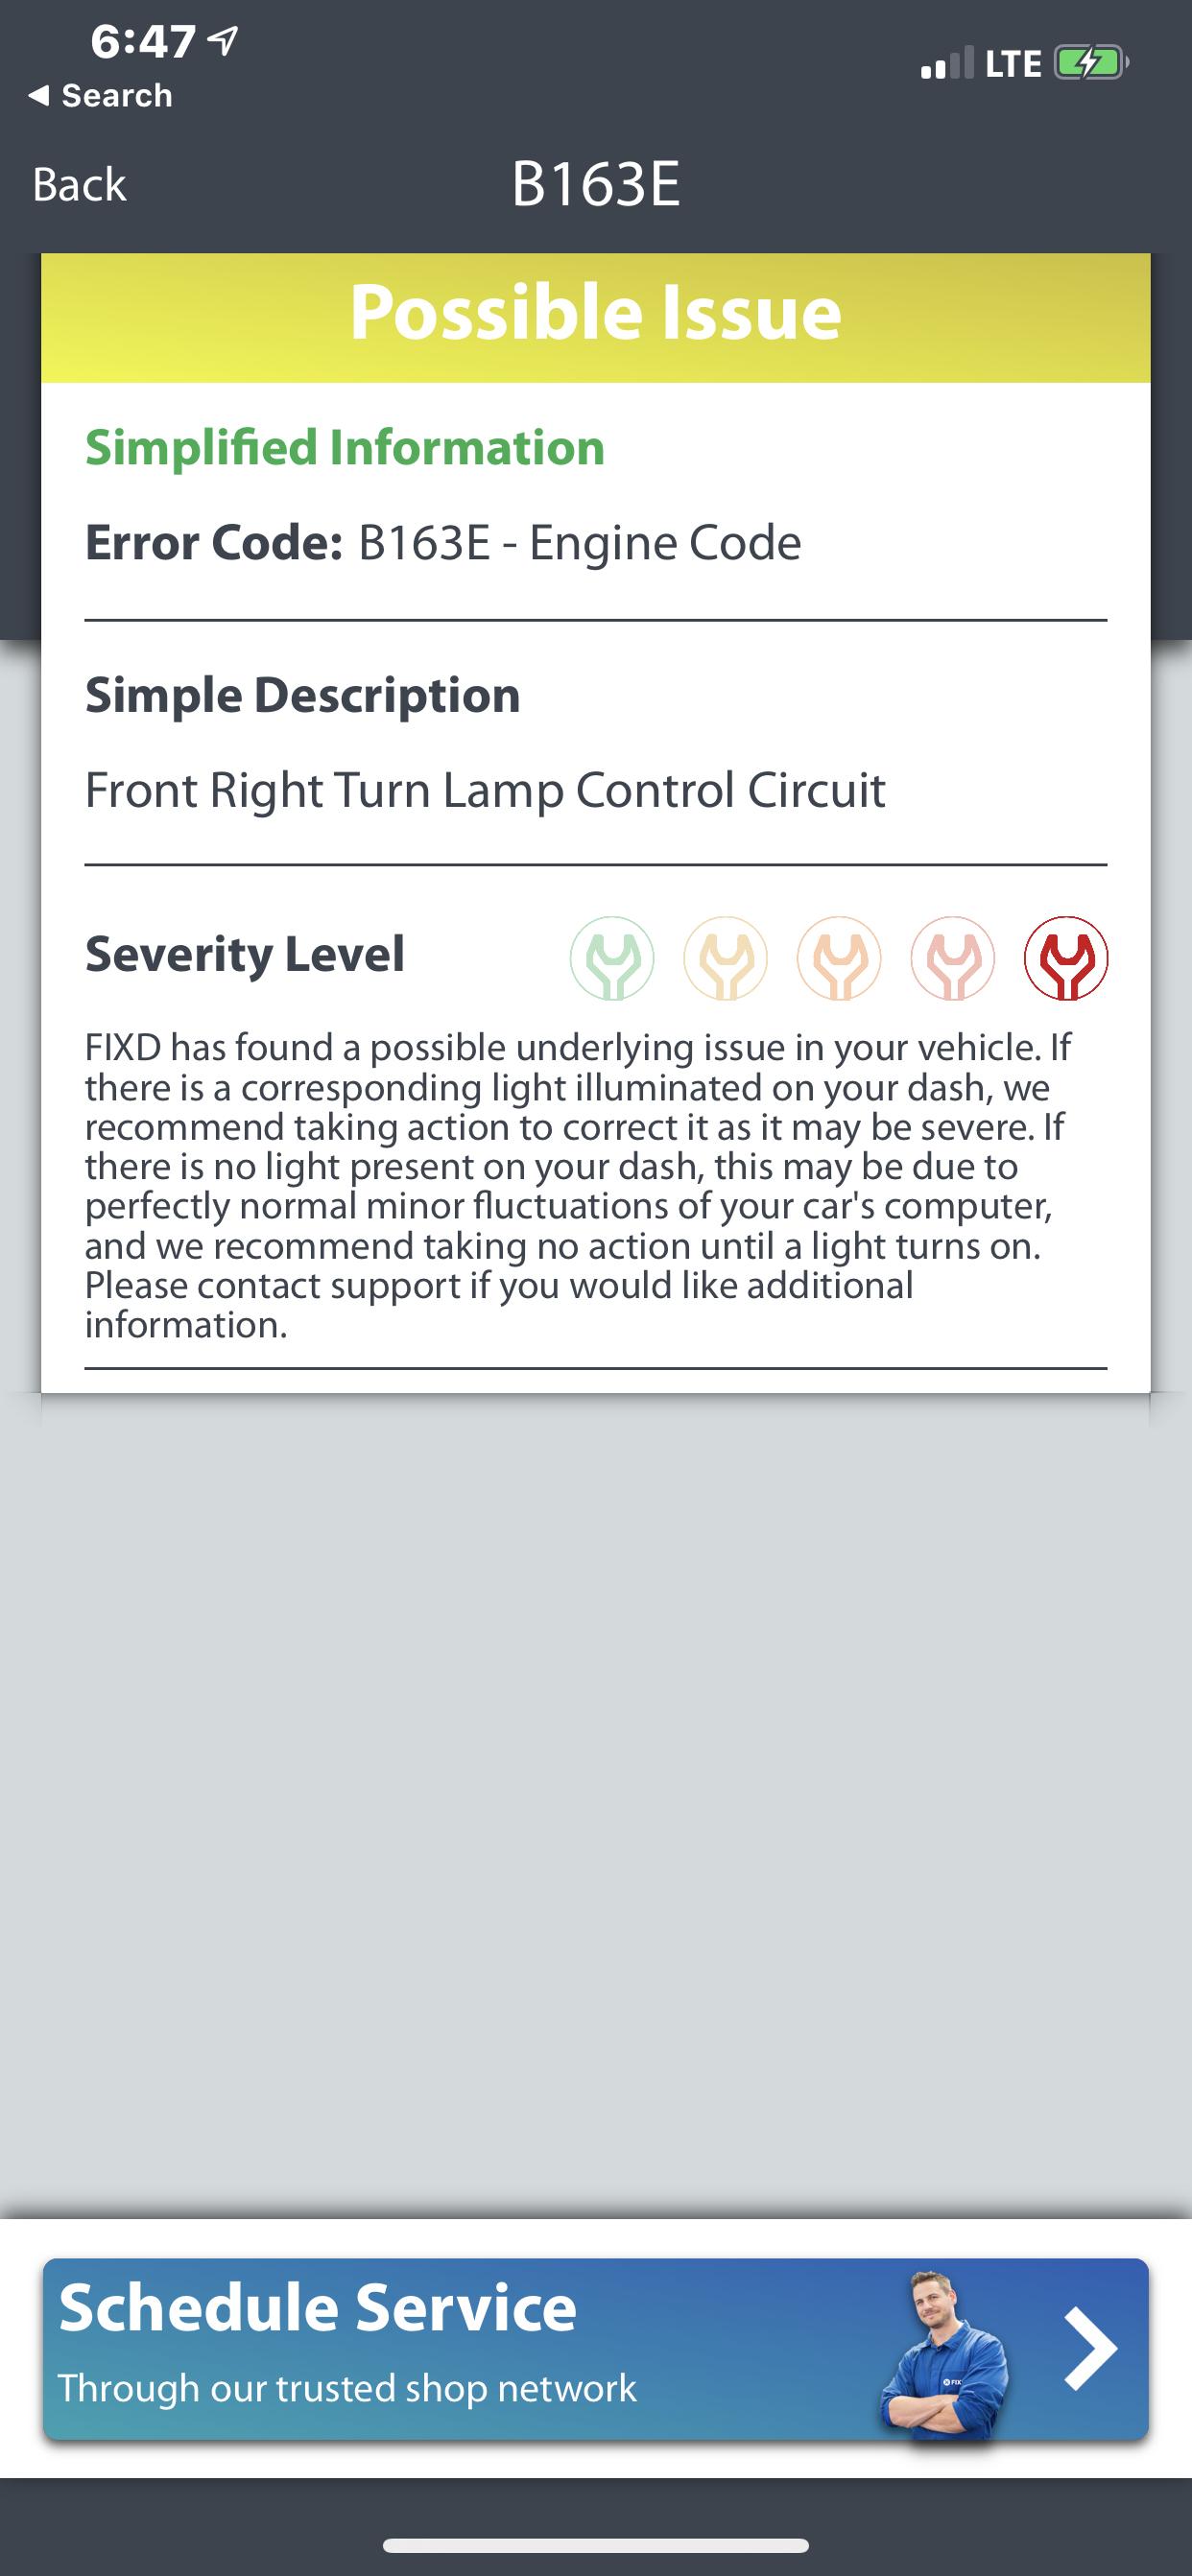 I got B163E-Engine code description says Front right turn lamp